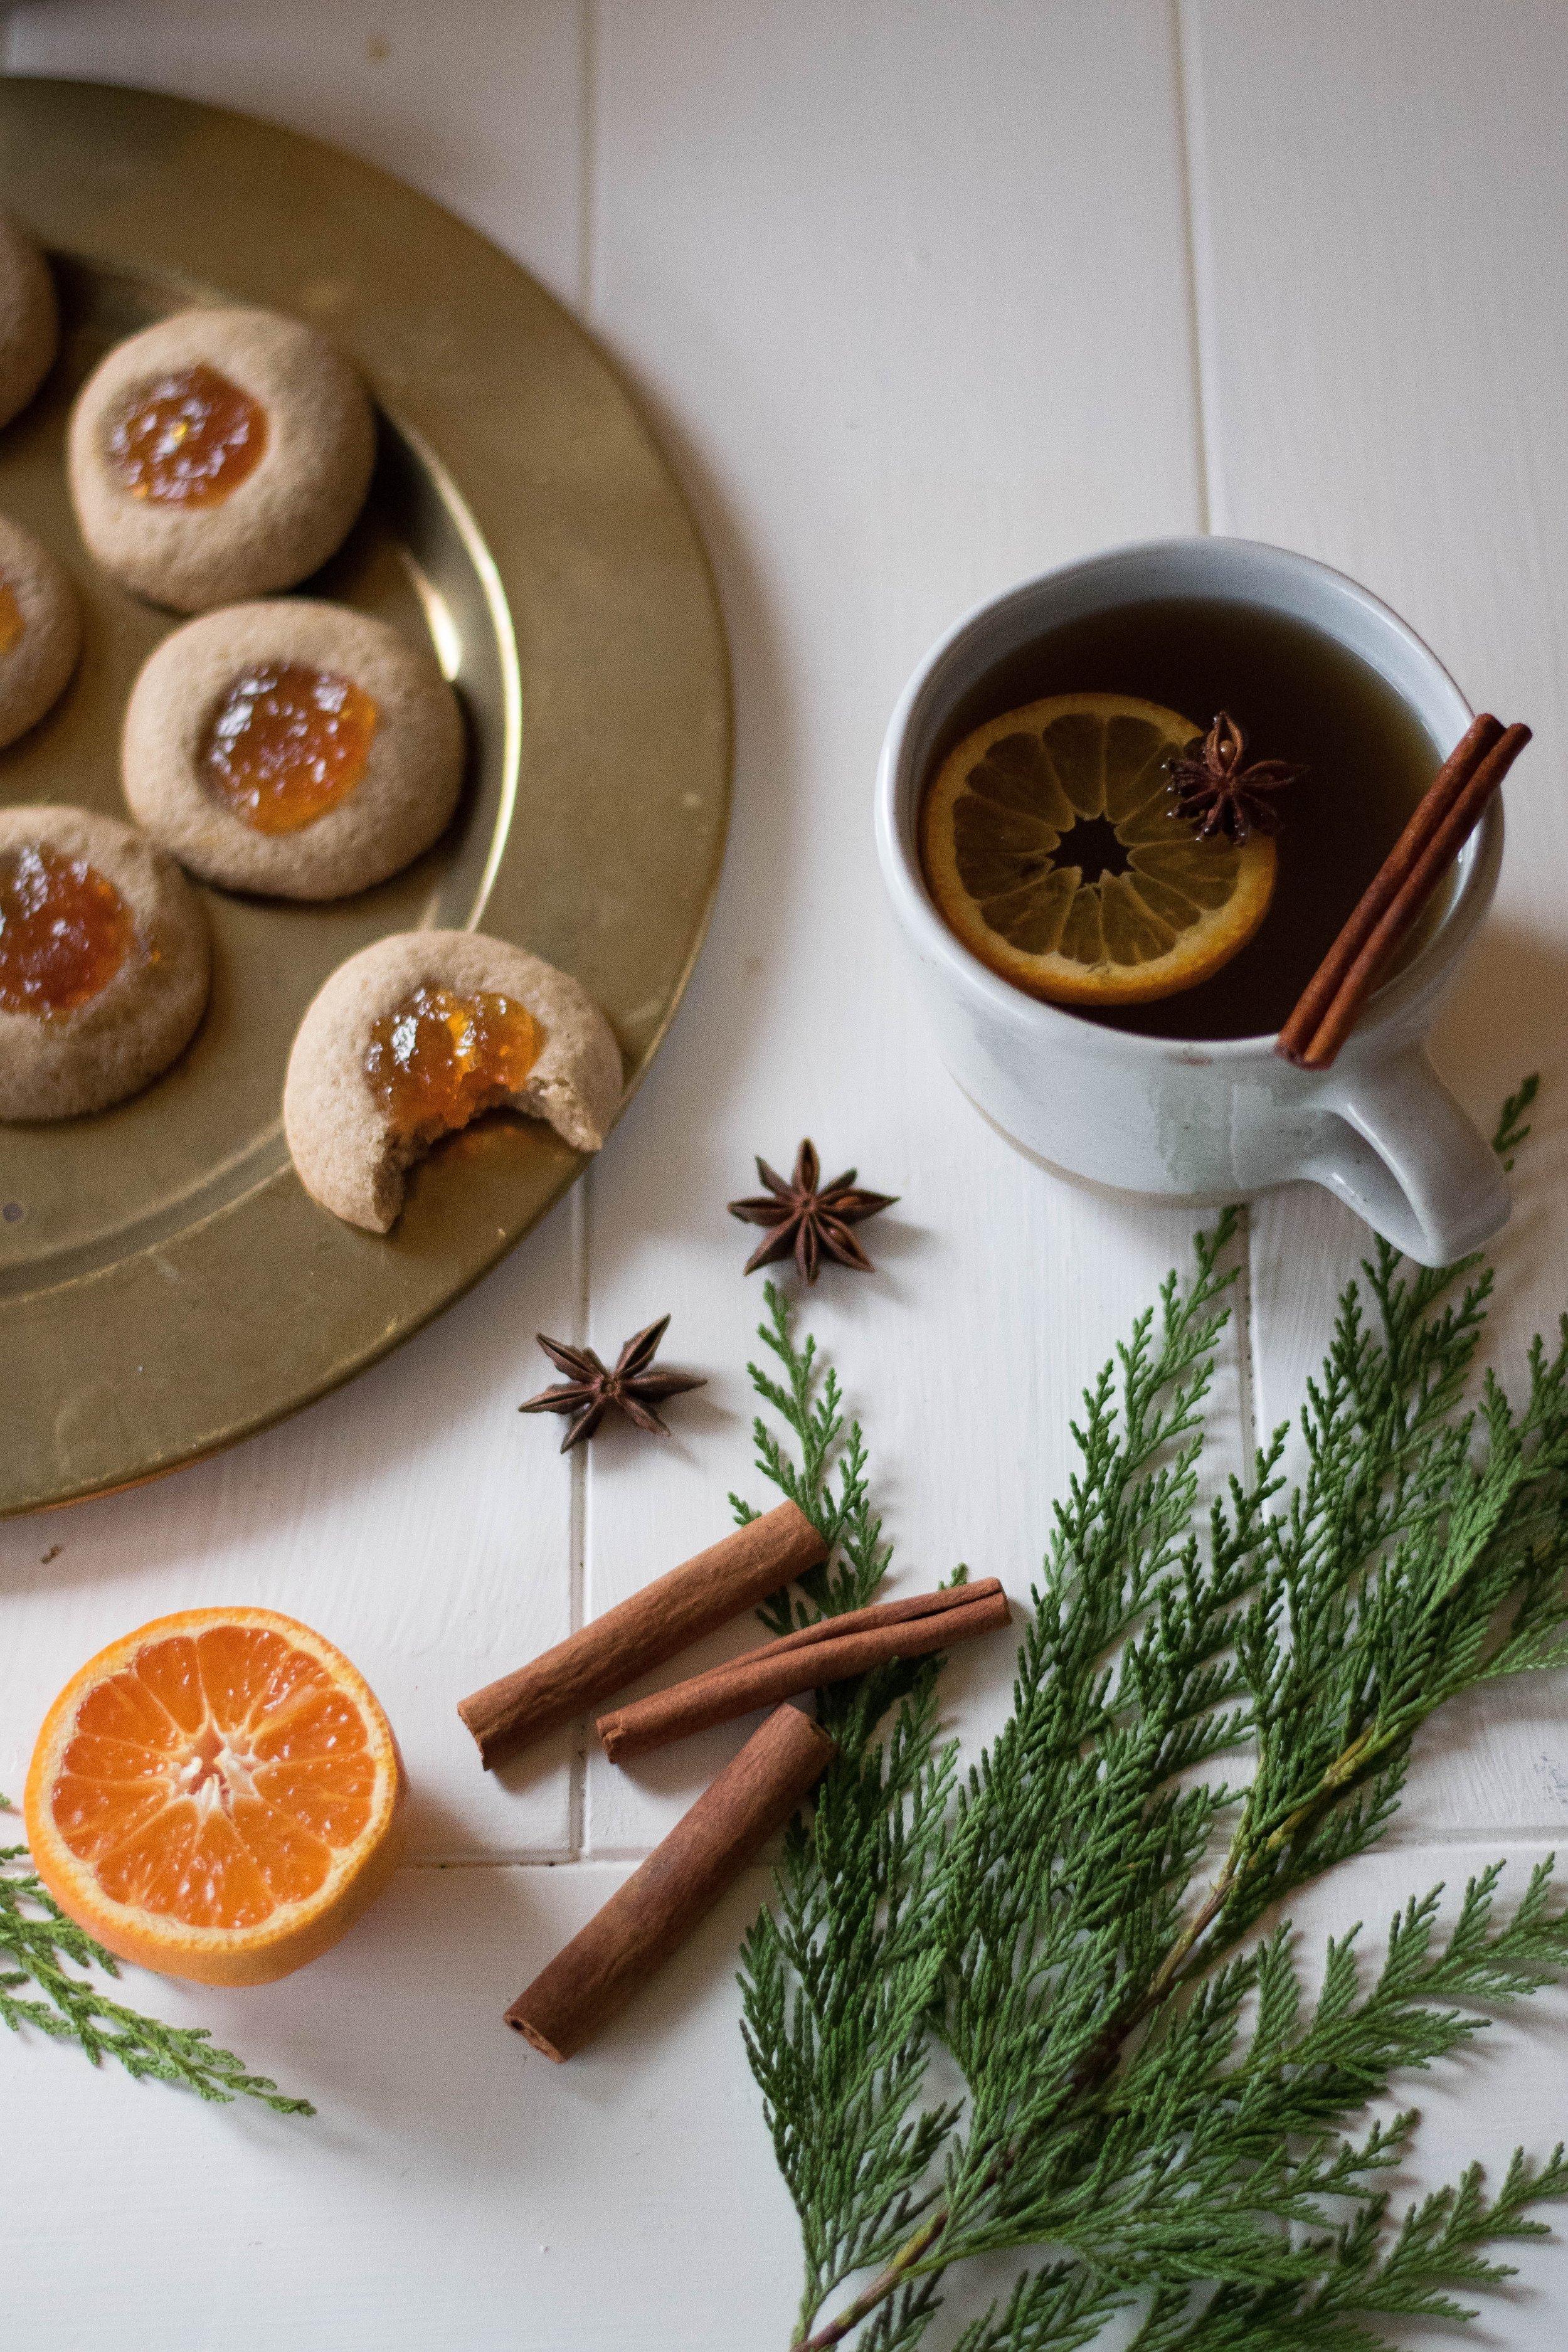 Mulling Spice + Orange Marmalade Thumbprint Cookies | All Purpose Flour Child